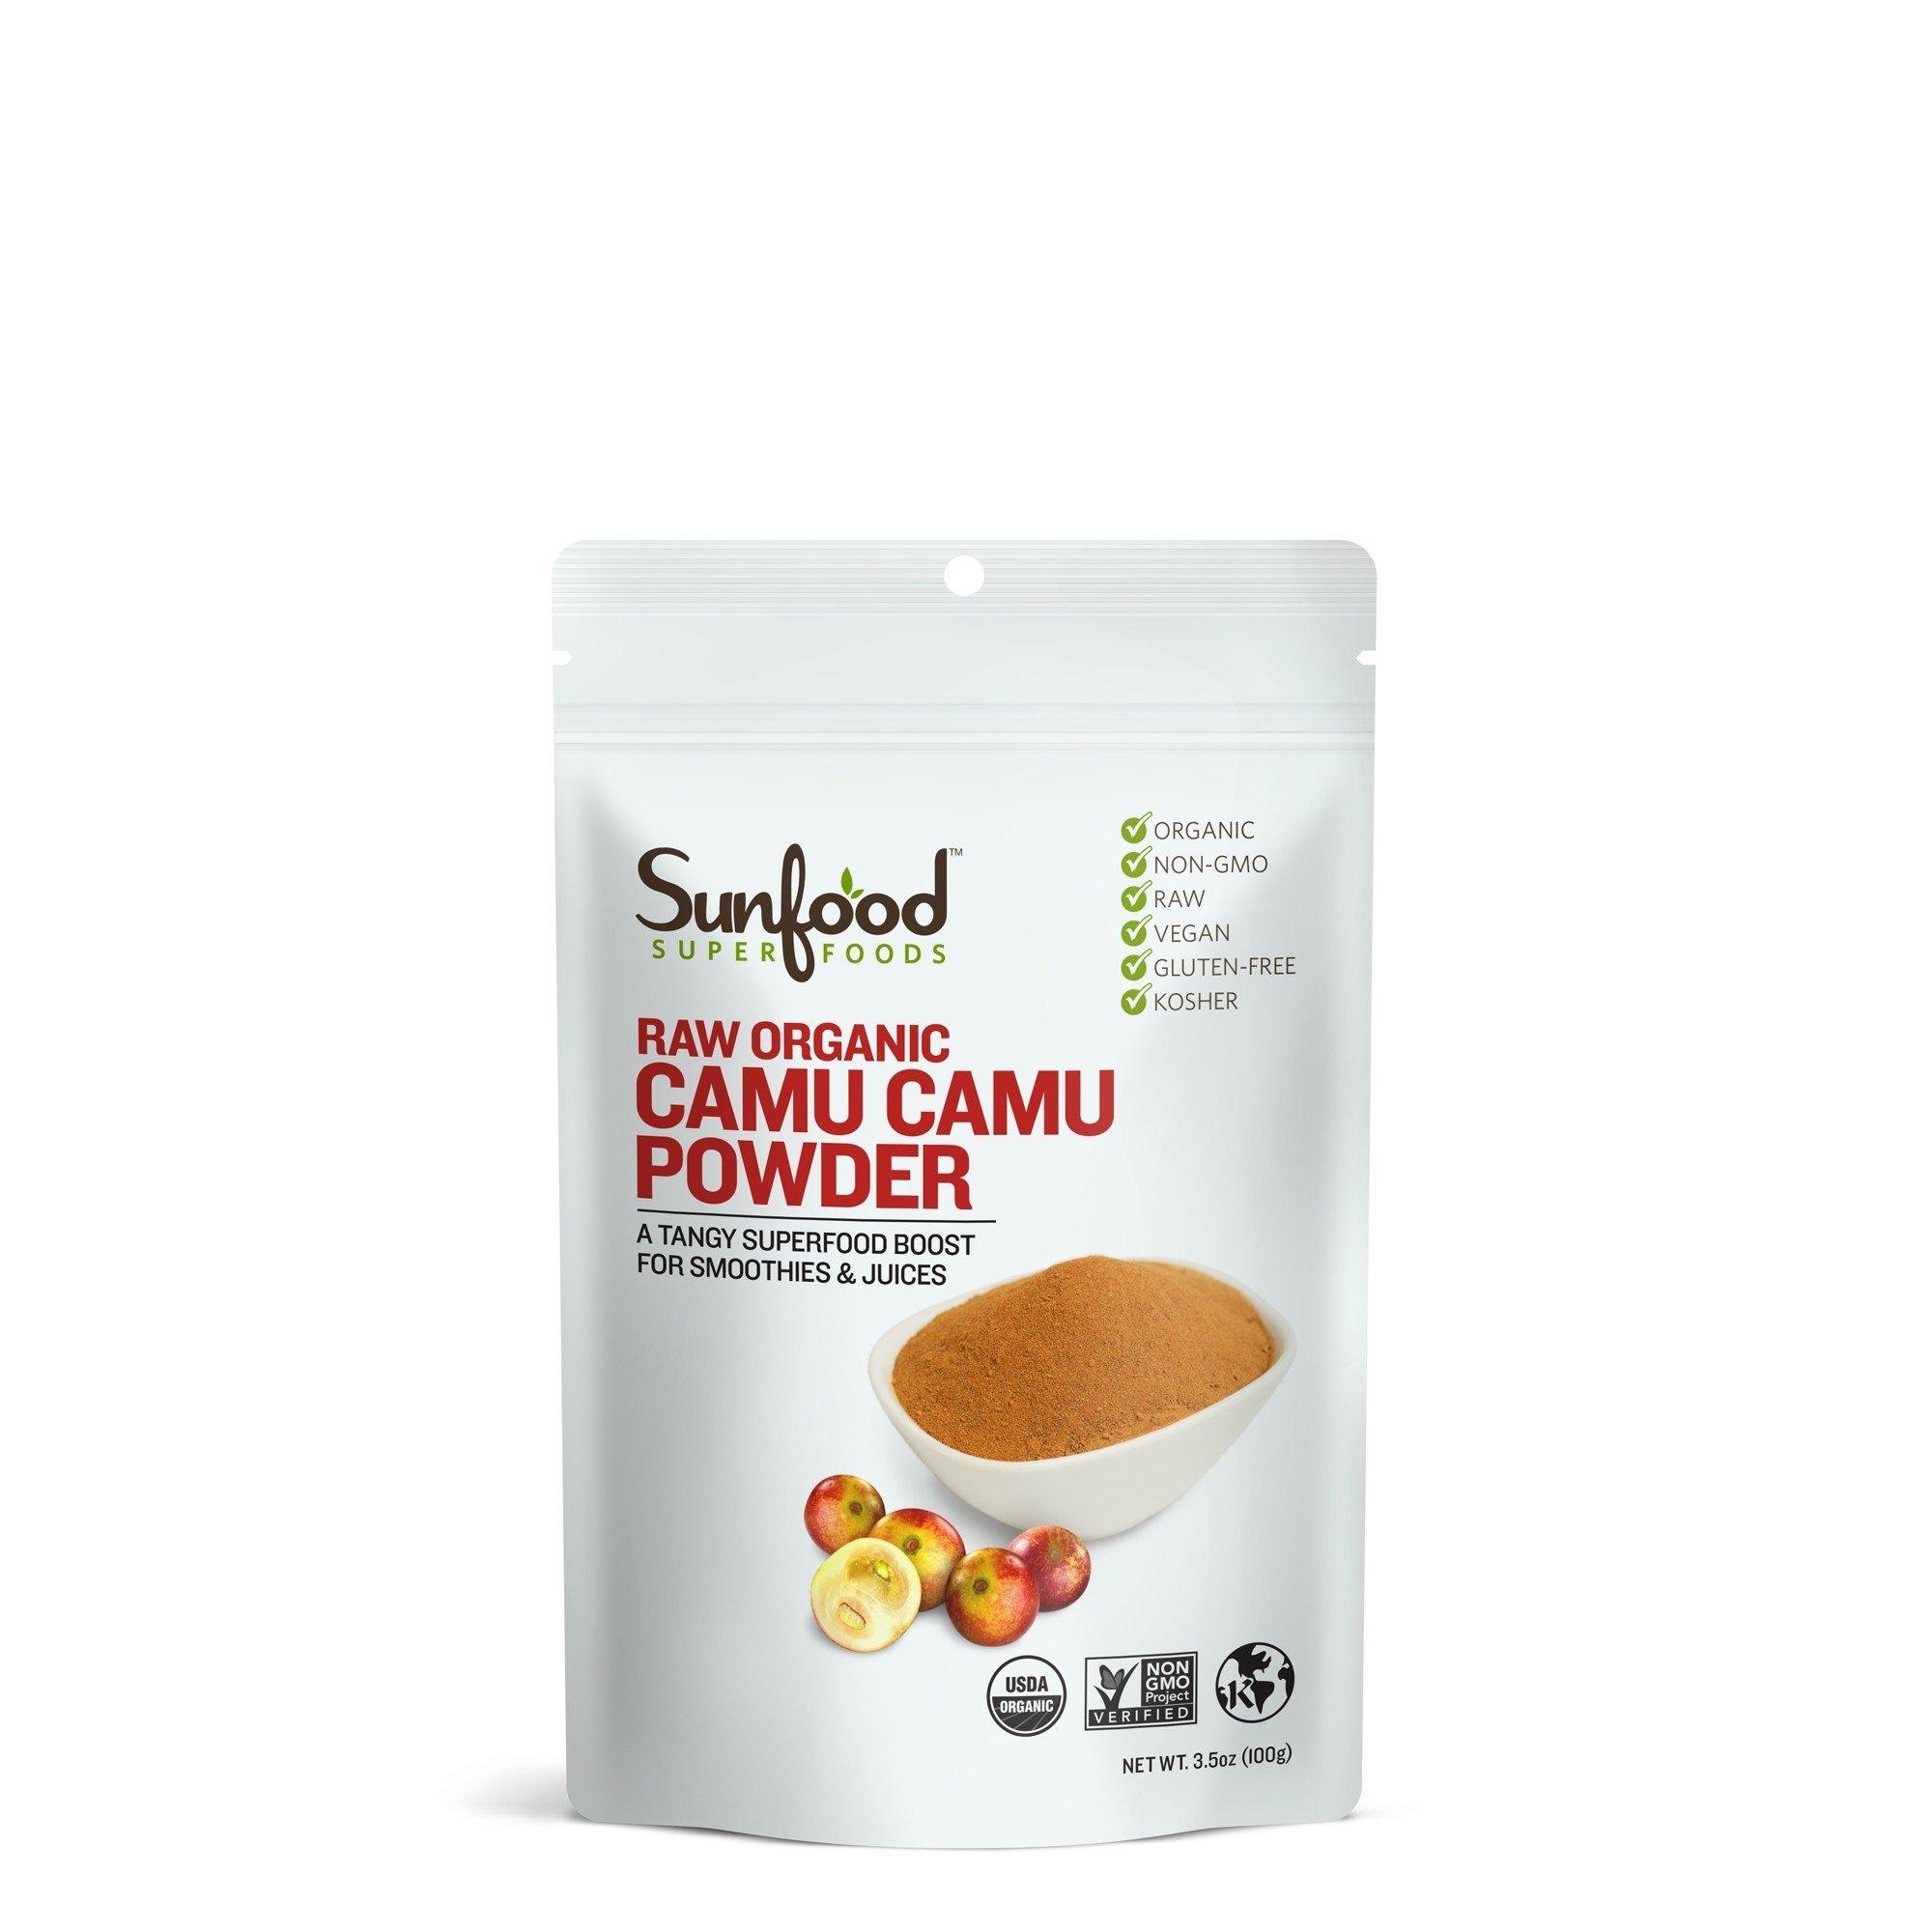 Sunfood Camu Camu Powder, 3.5 oz, Organic, Raw